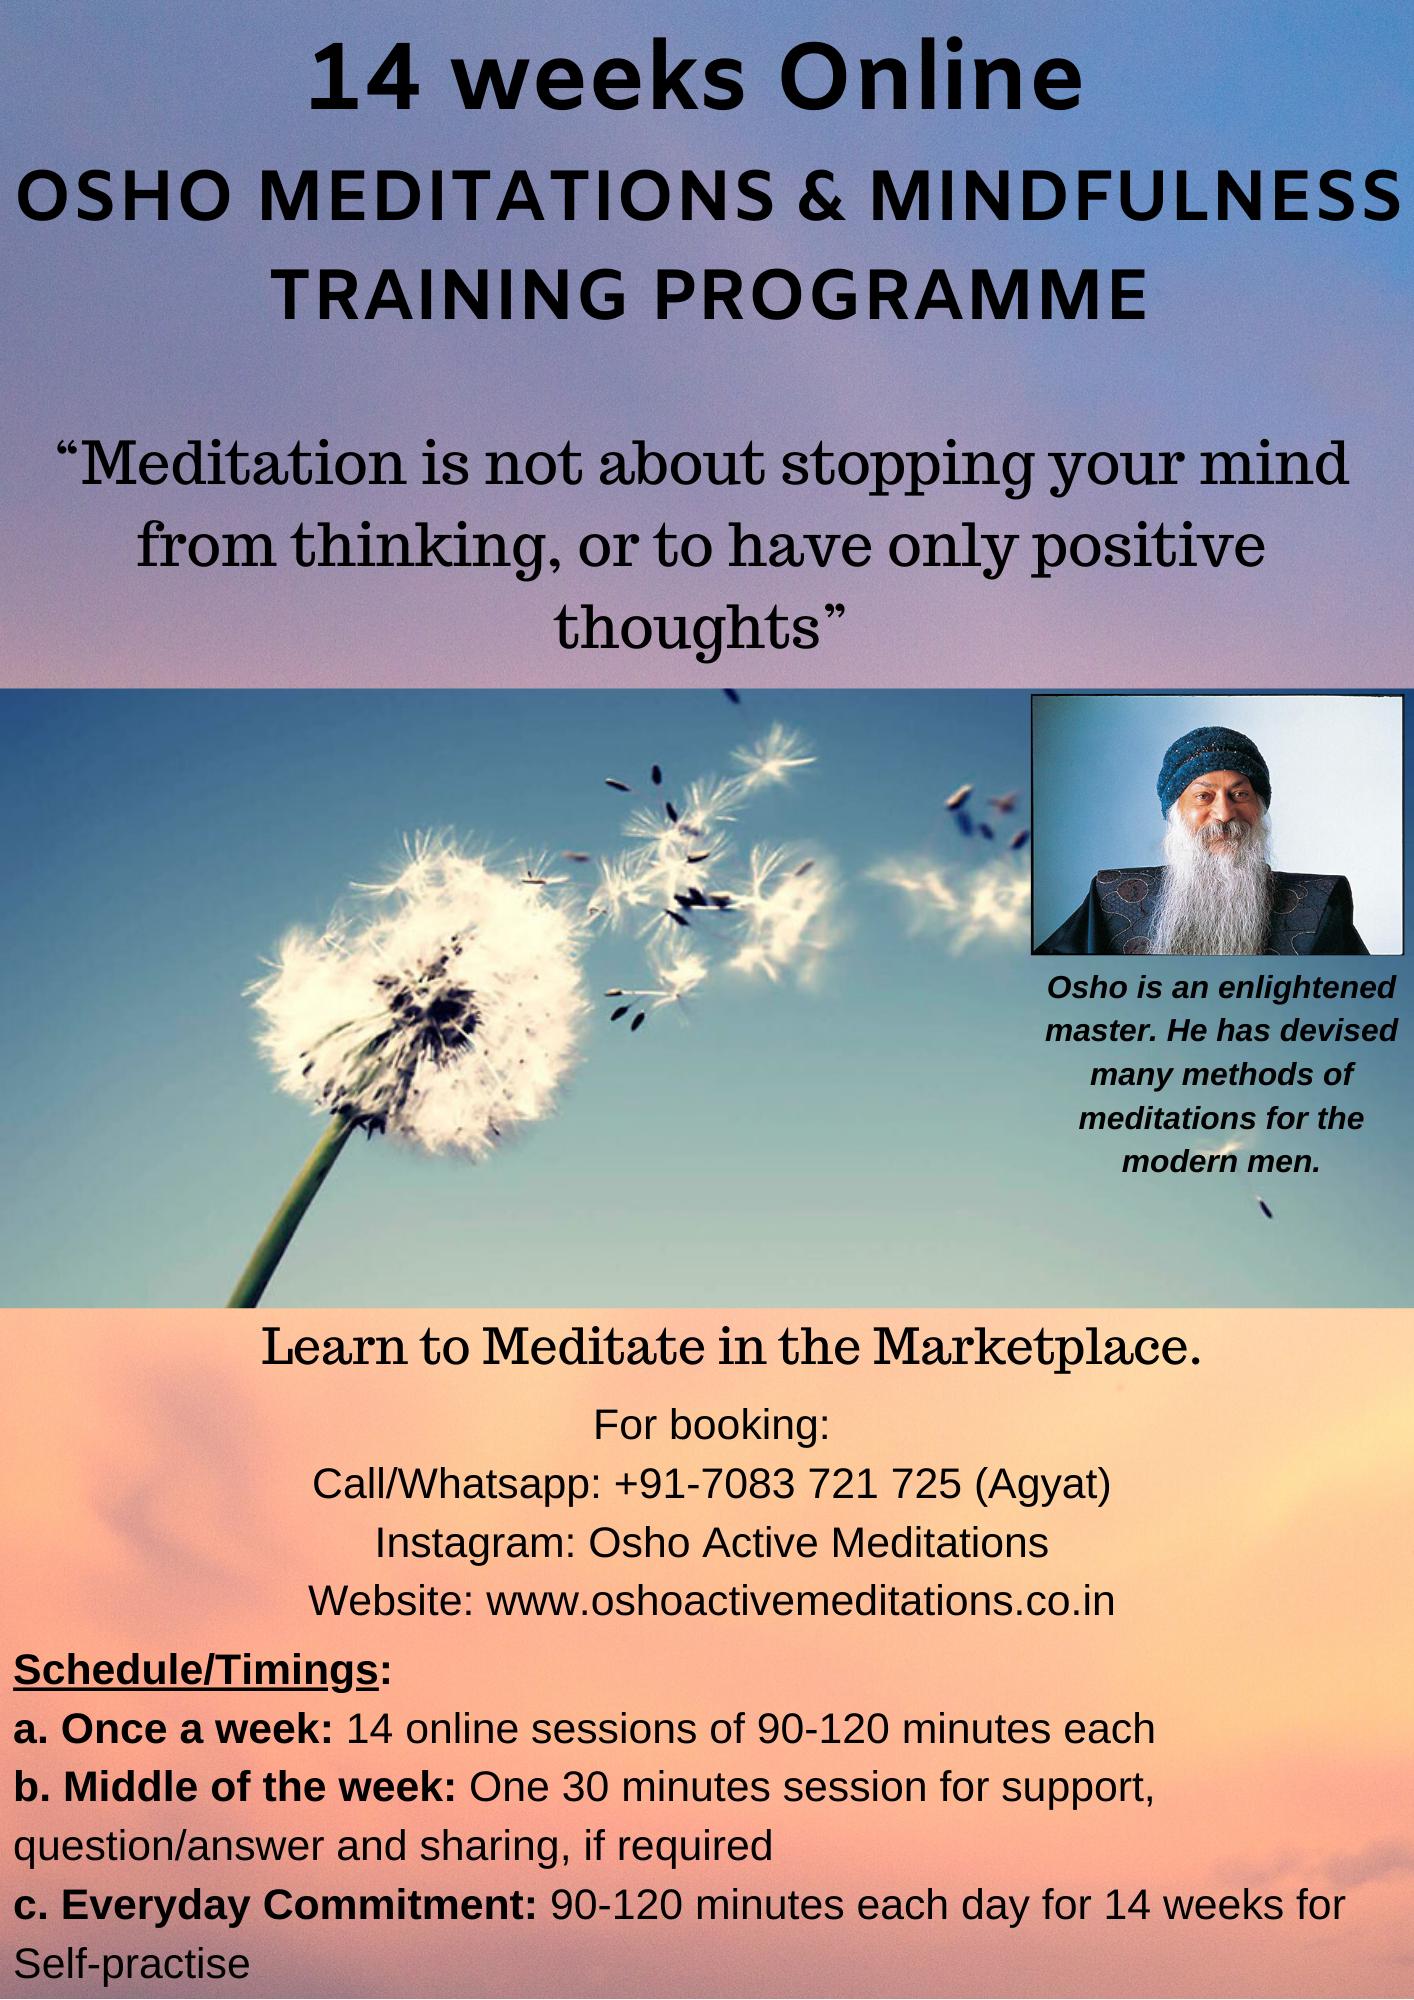 14 weeks online - Osho Meditations and Mindfulness Training Programme - Pic